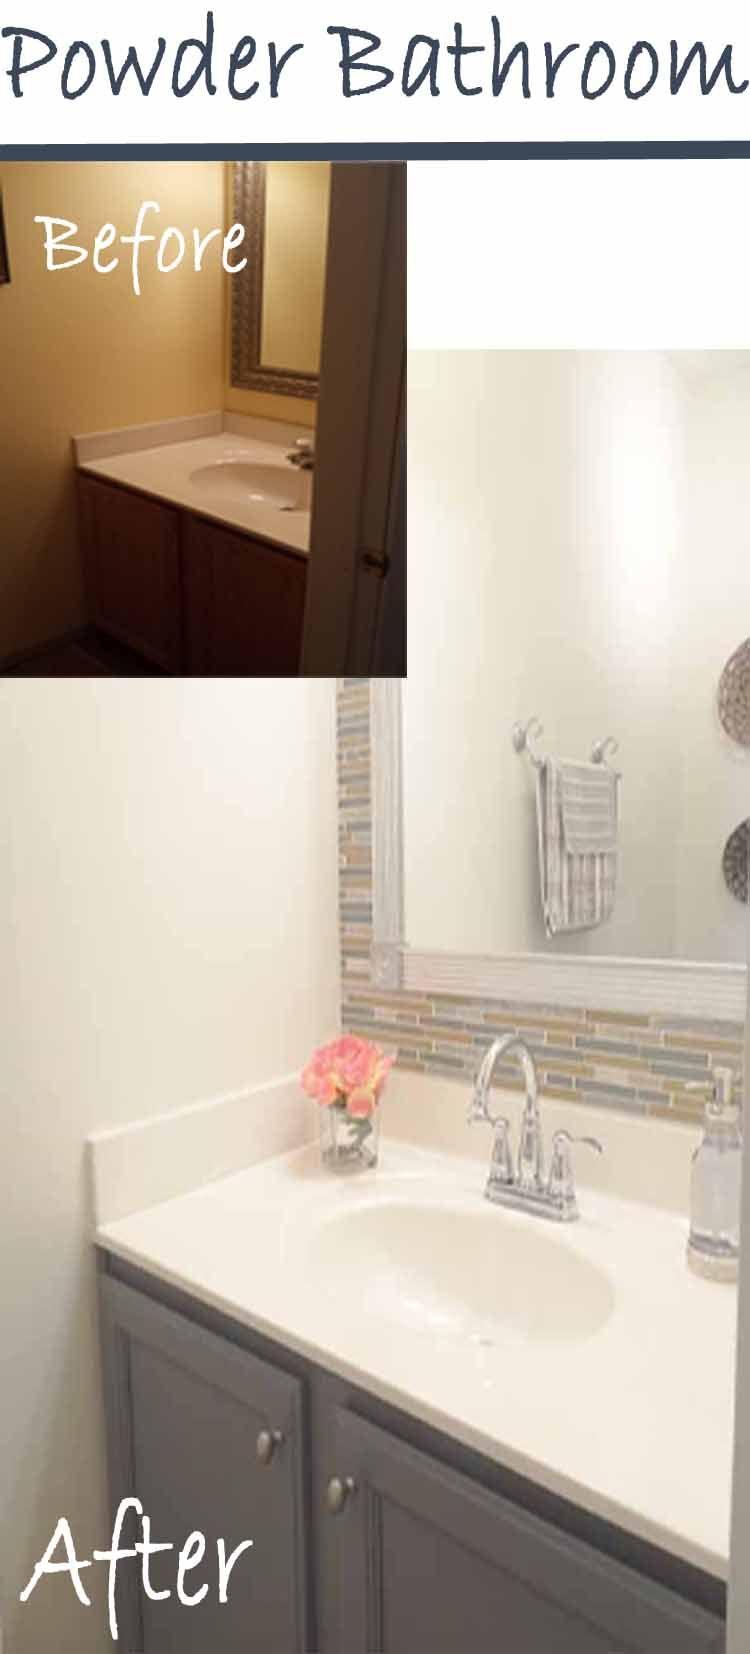 Budget Salle De Bain Complete ~ powder bathroom makeover pinterest salle de bains salle et sdb